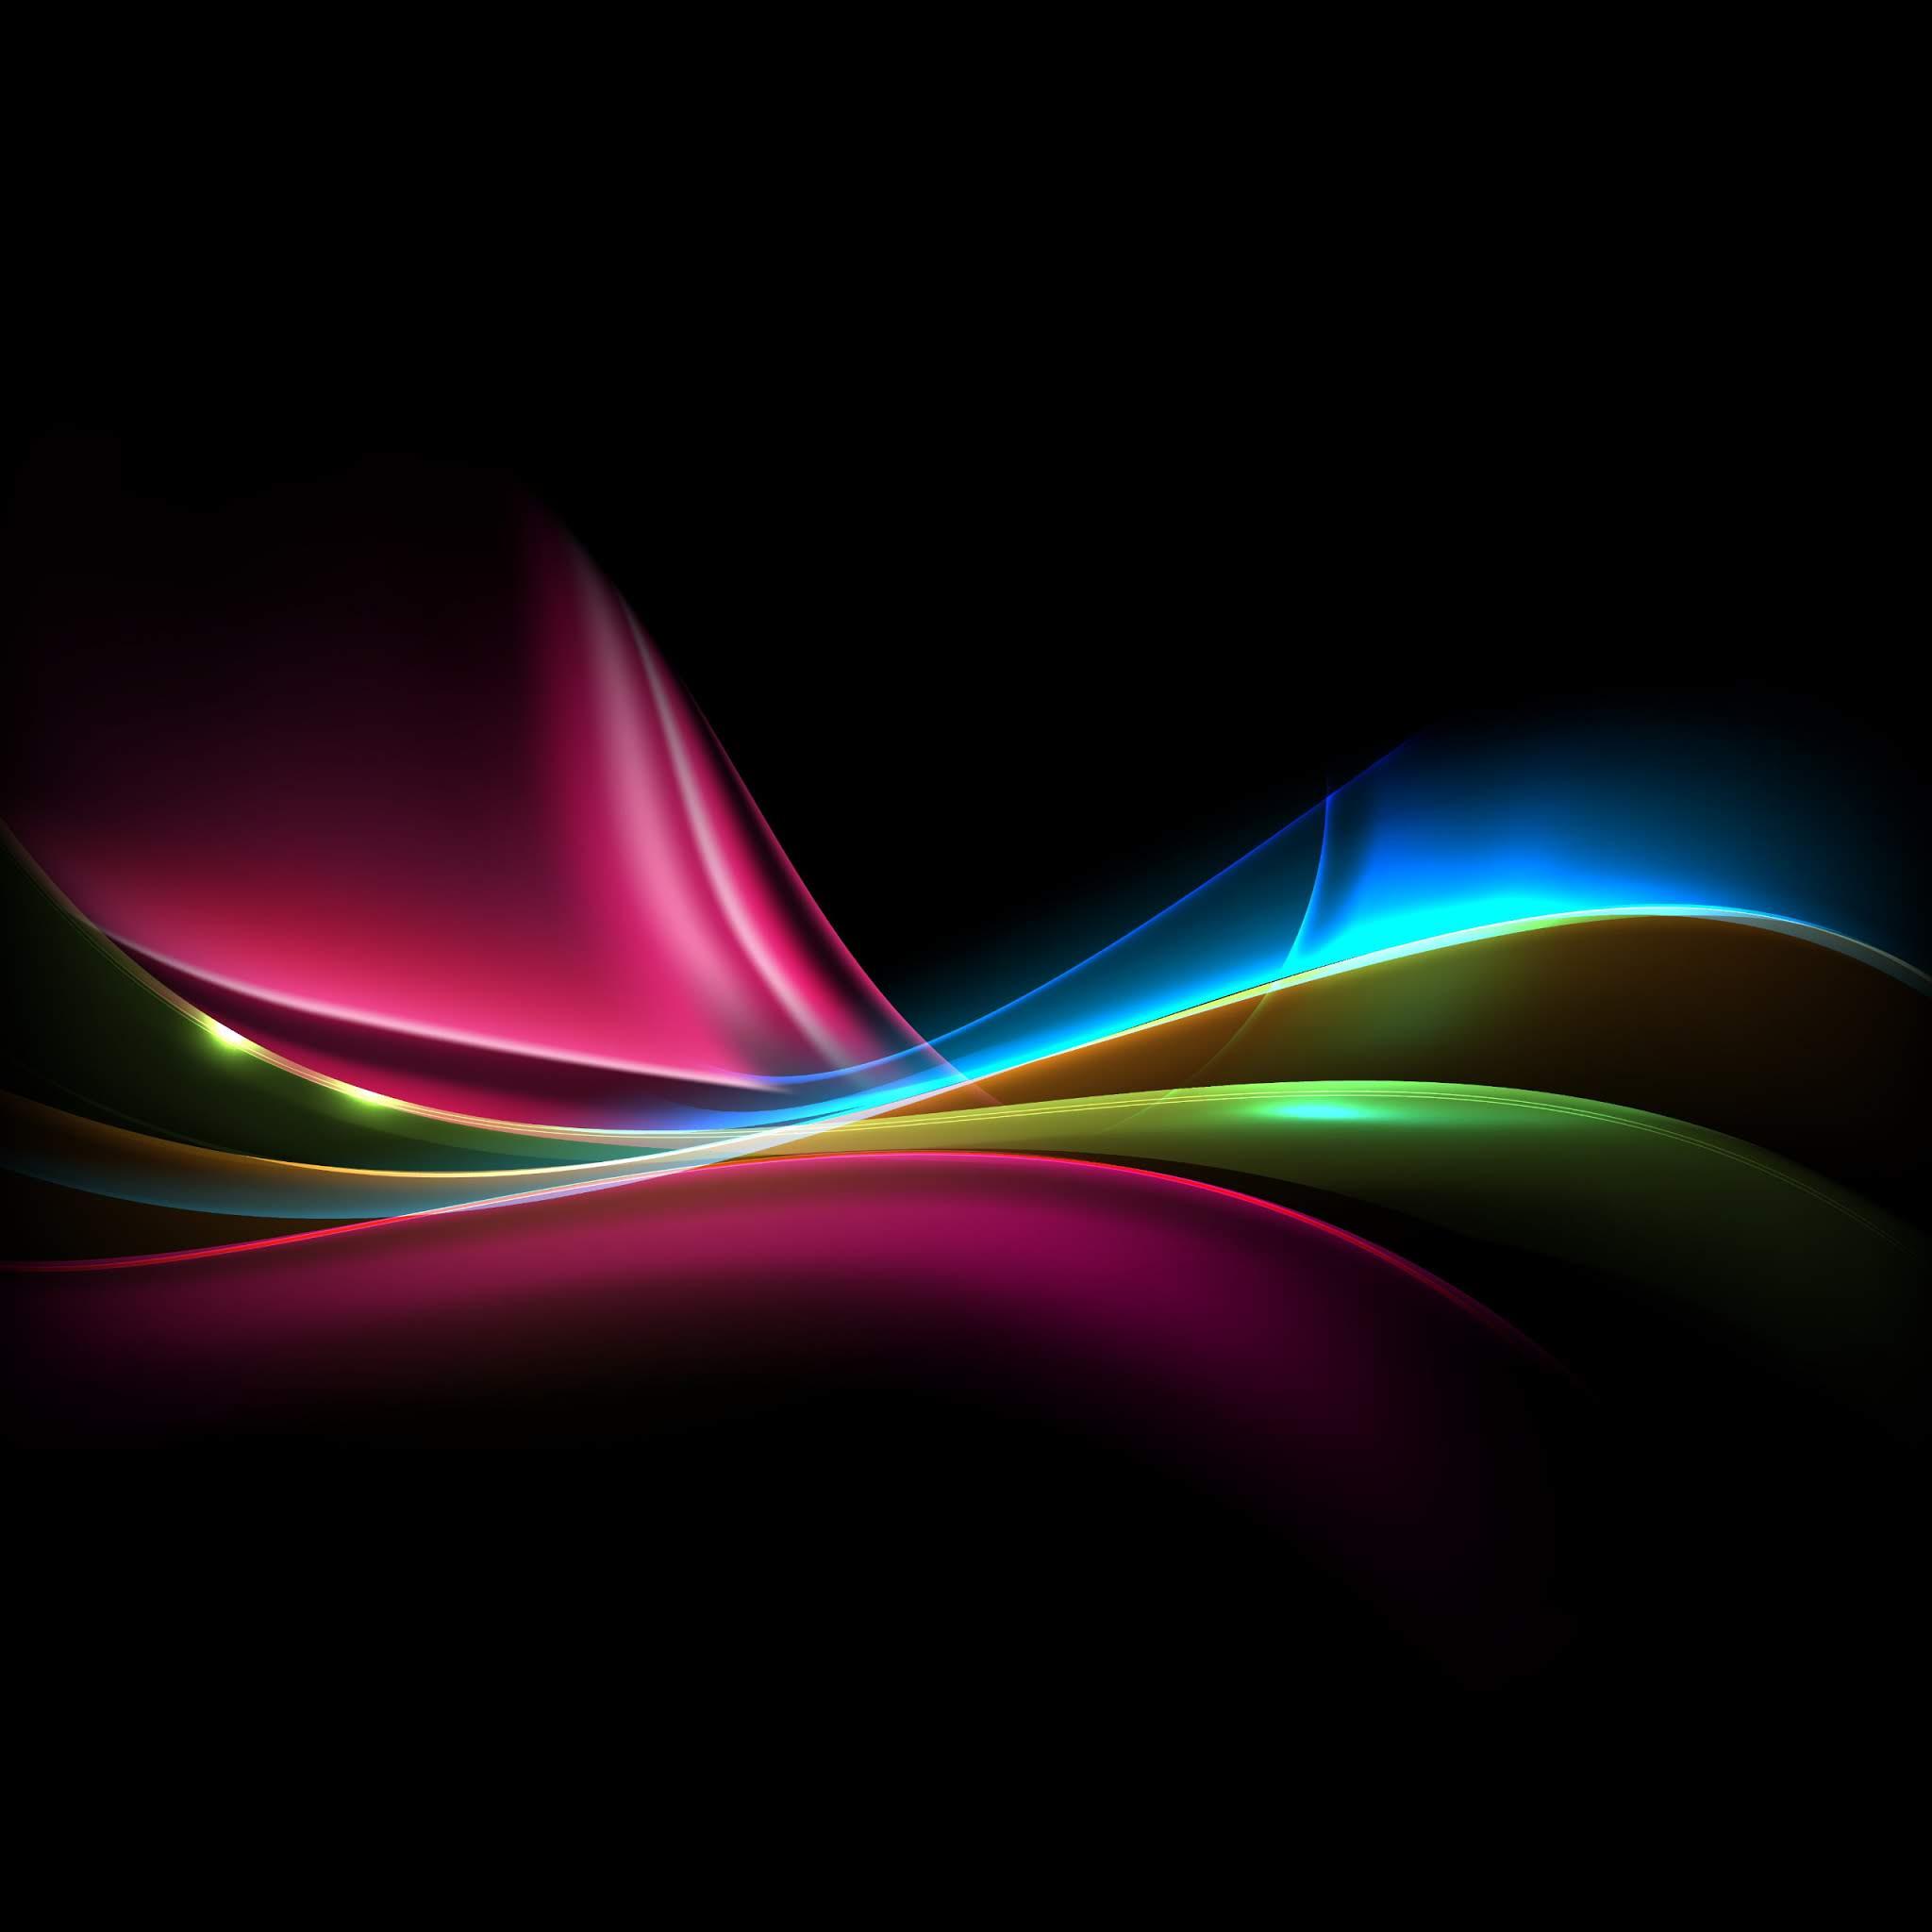 Fond D Ecran Tablette Samsung 2048x2048 Wallpaper Teahub Io